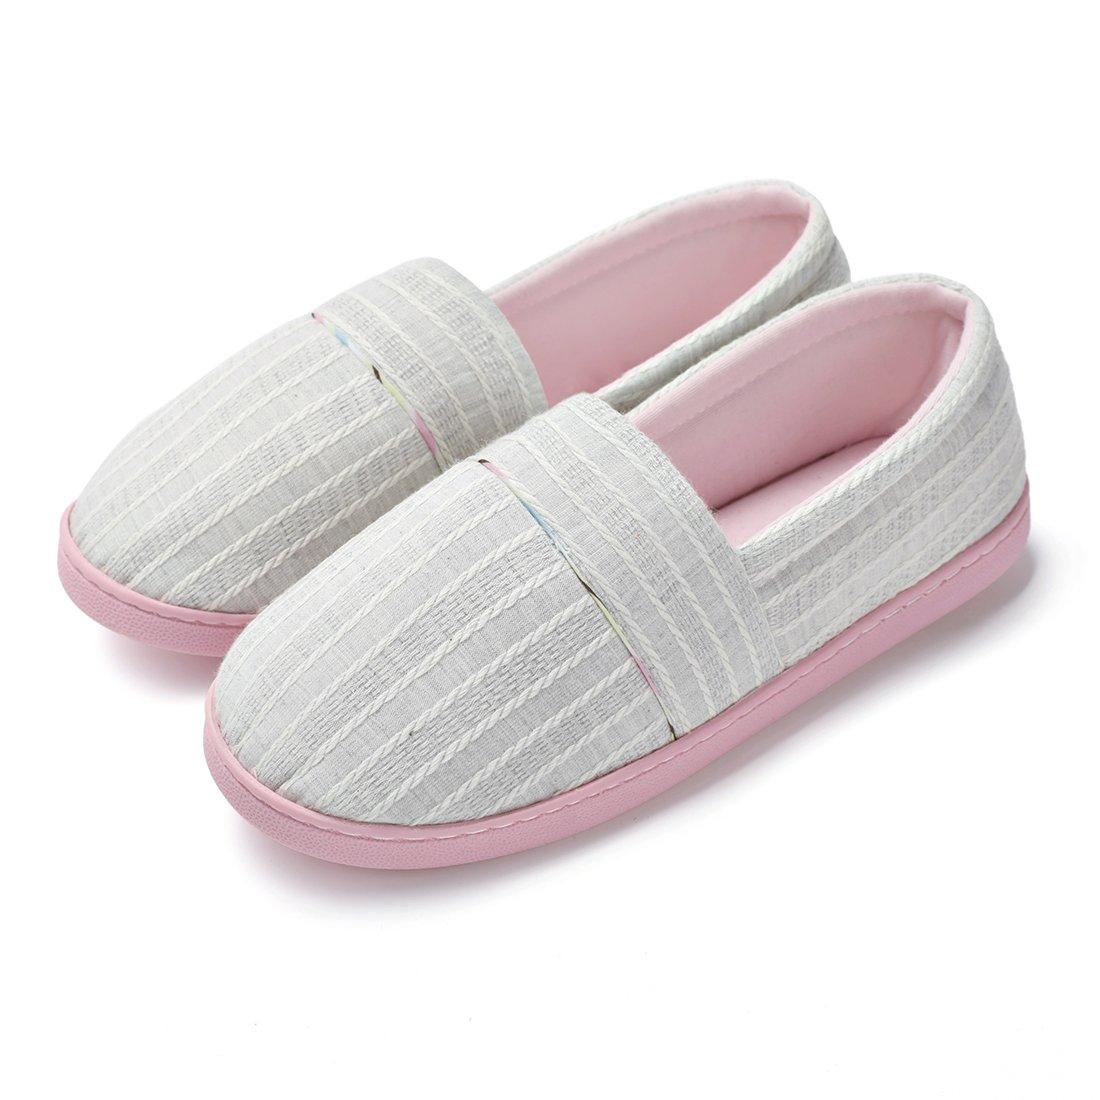 ChicNChic Women Comfortable Cotton Knit Anti-Slip House Slipper Washable Slip-On Home Shoes (8-8.5 B(M) US, Light Grey)